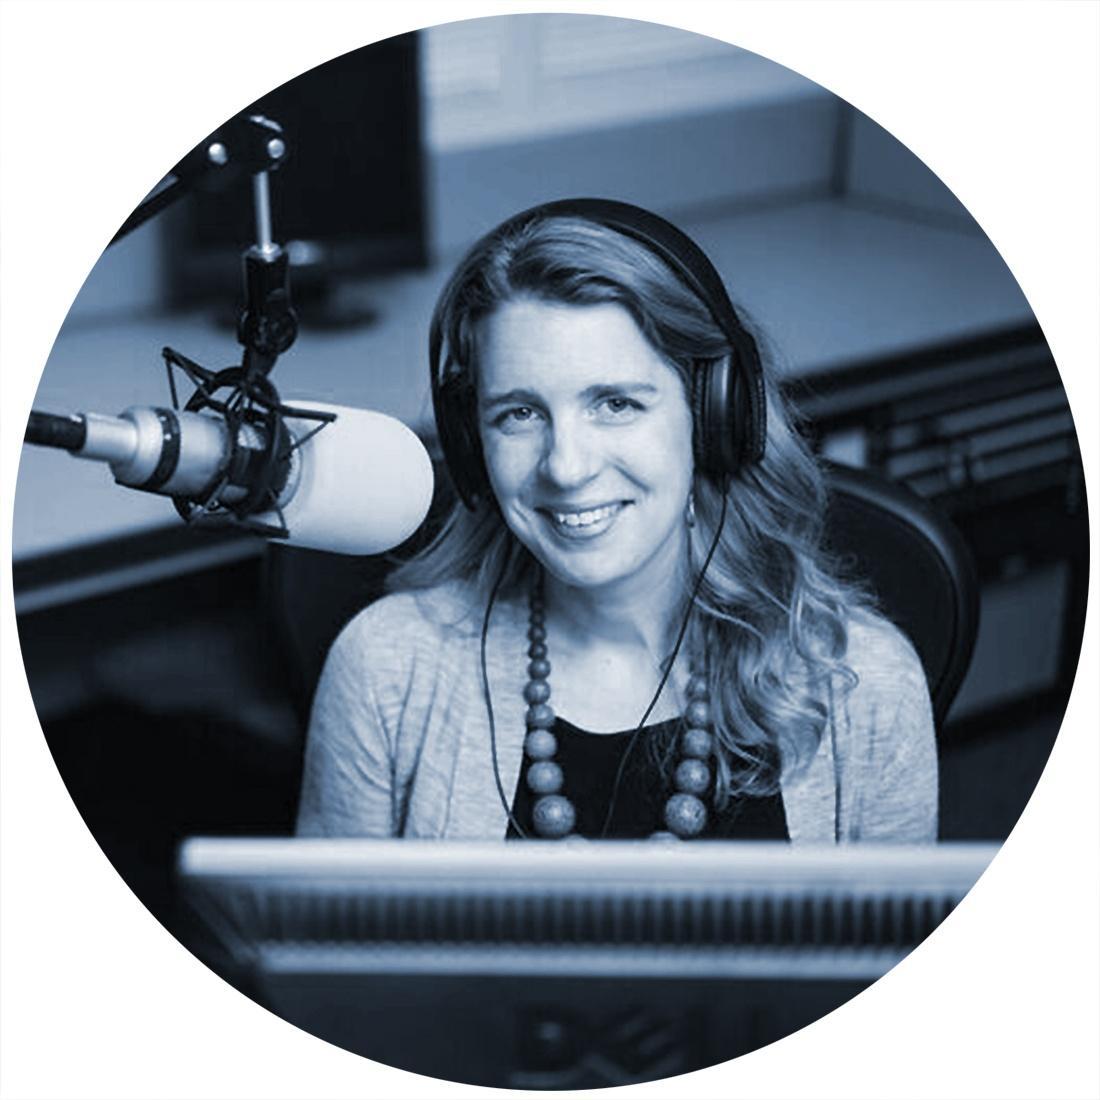 Andrea Smardon, host of More Than Half Podcast